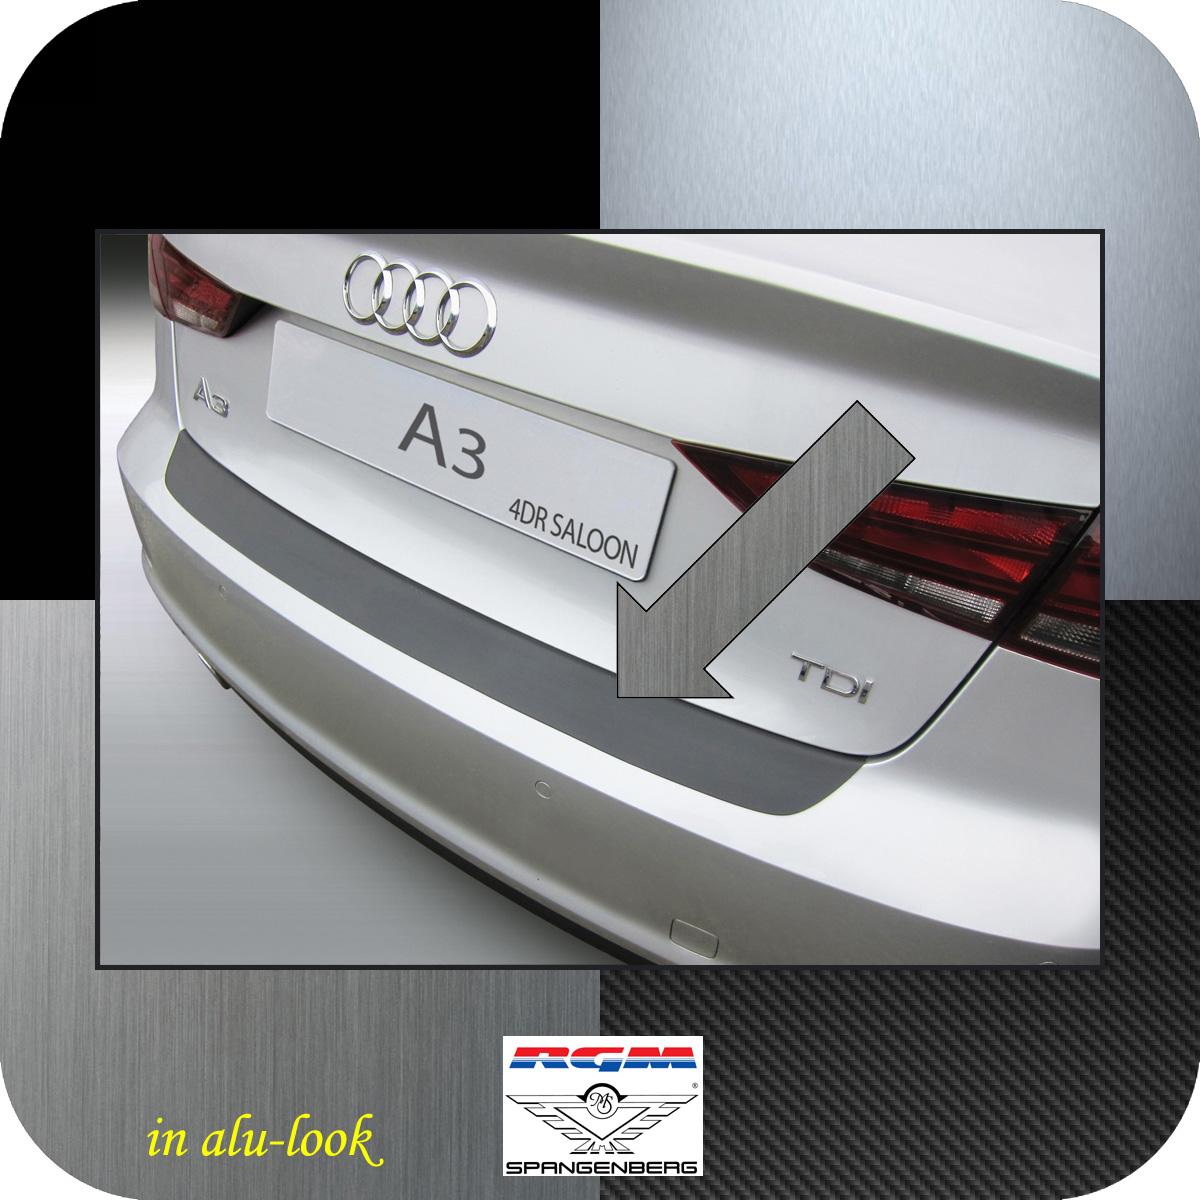 Ladekantenschutz Alu-Look Audi A3 8V Limousine 4-Türer ab Baujahr 2013- 3504926